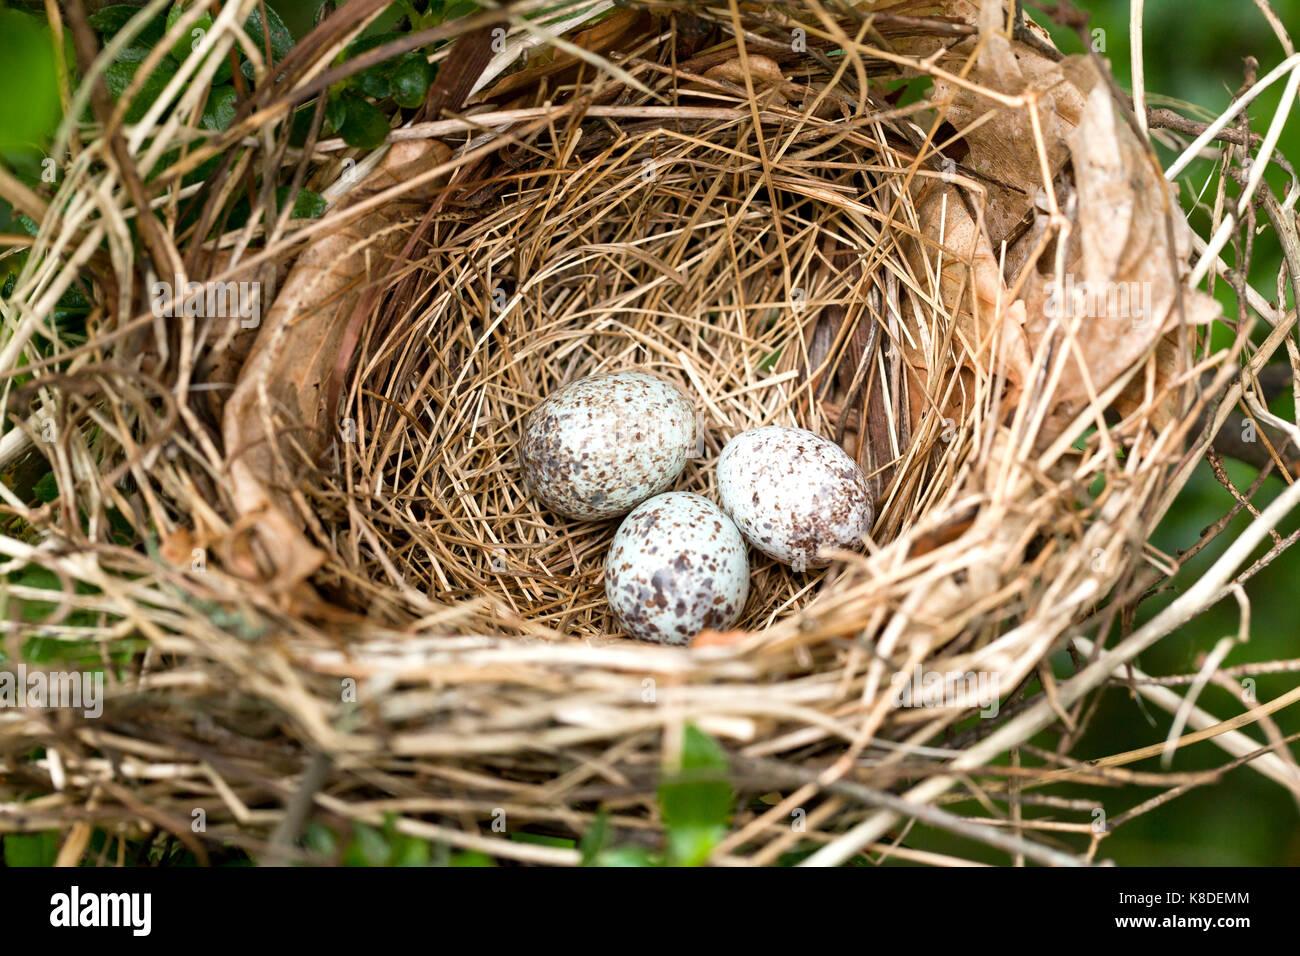 Northern Cardinal bird eggs in nest - Virginia USA - Stock Image